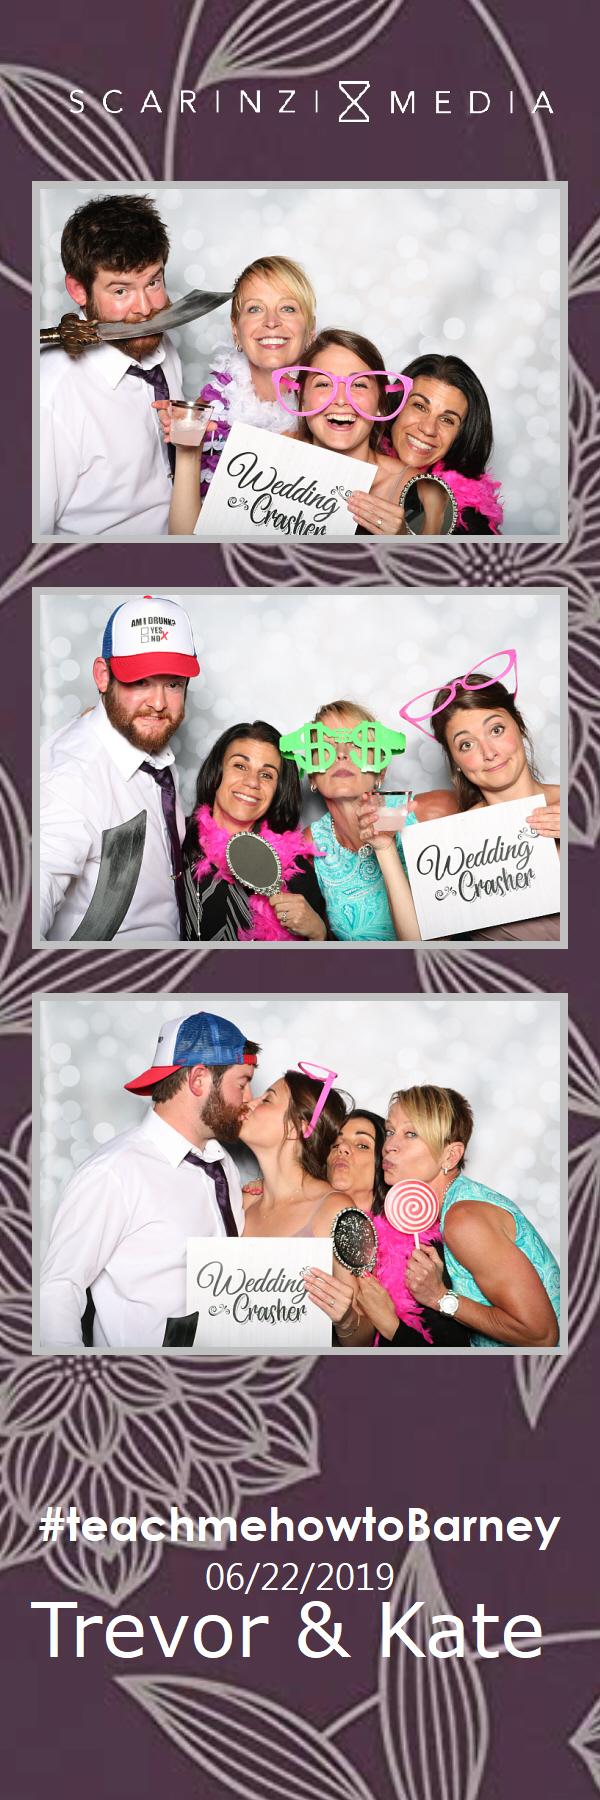 2019.06.22 - Barney Wedding PHOTOBOOTH40.jpg